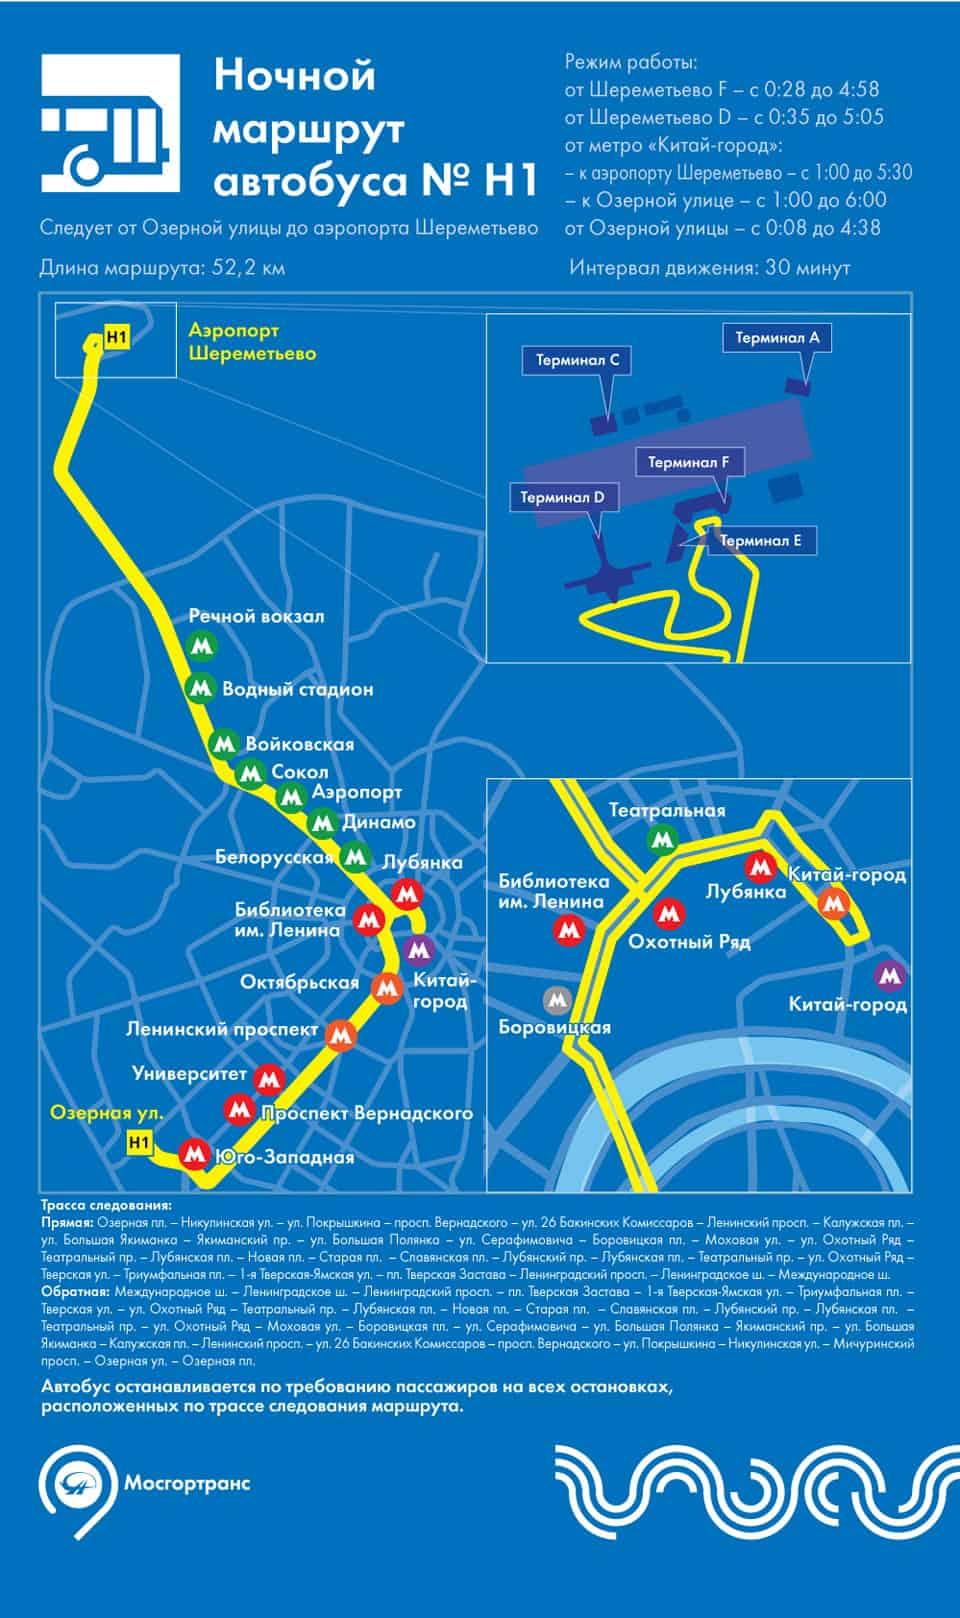 Ночной маршрут автобуса